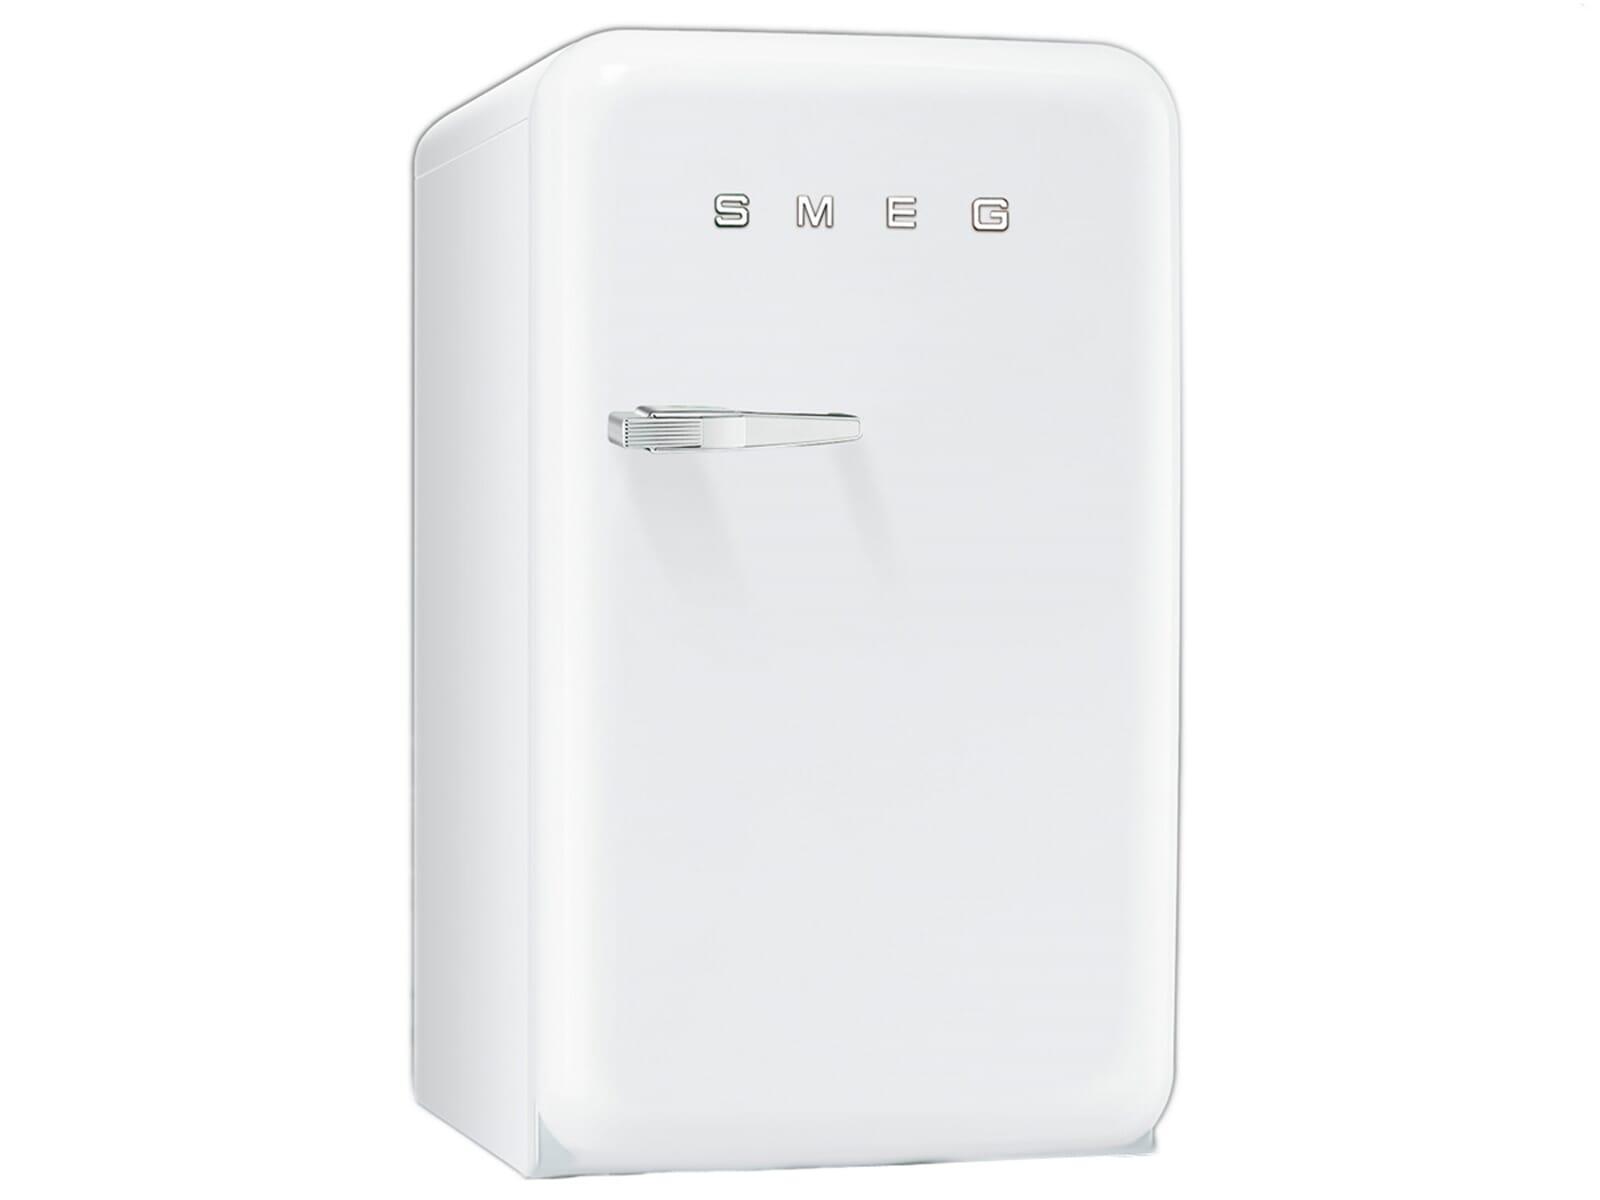 Smeg Kühlschrank Bewertung : ᐅ smeg fab test ⇒ aktueller testbericht mit video